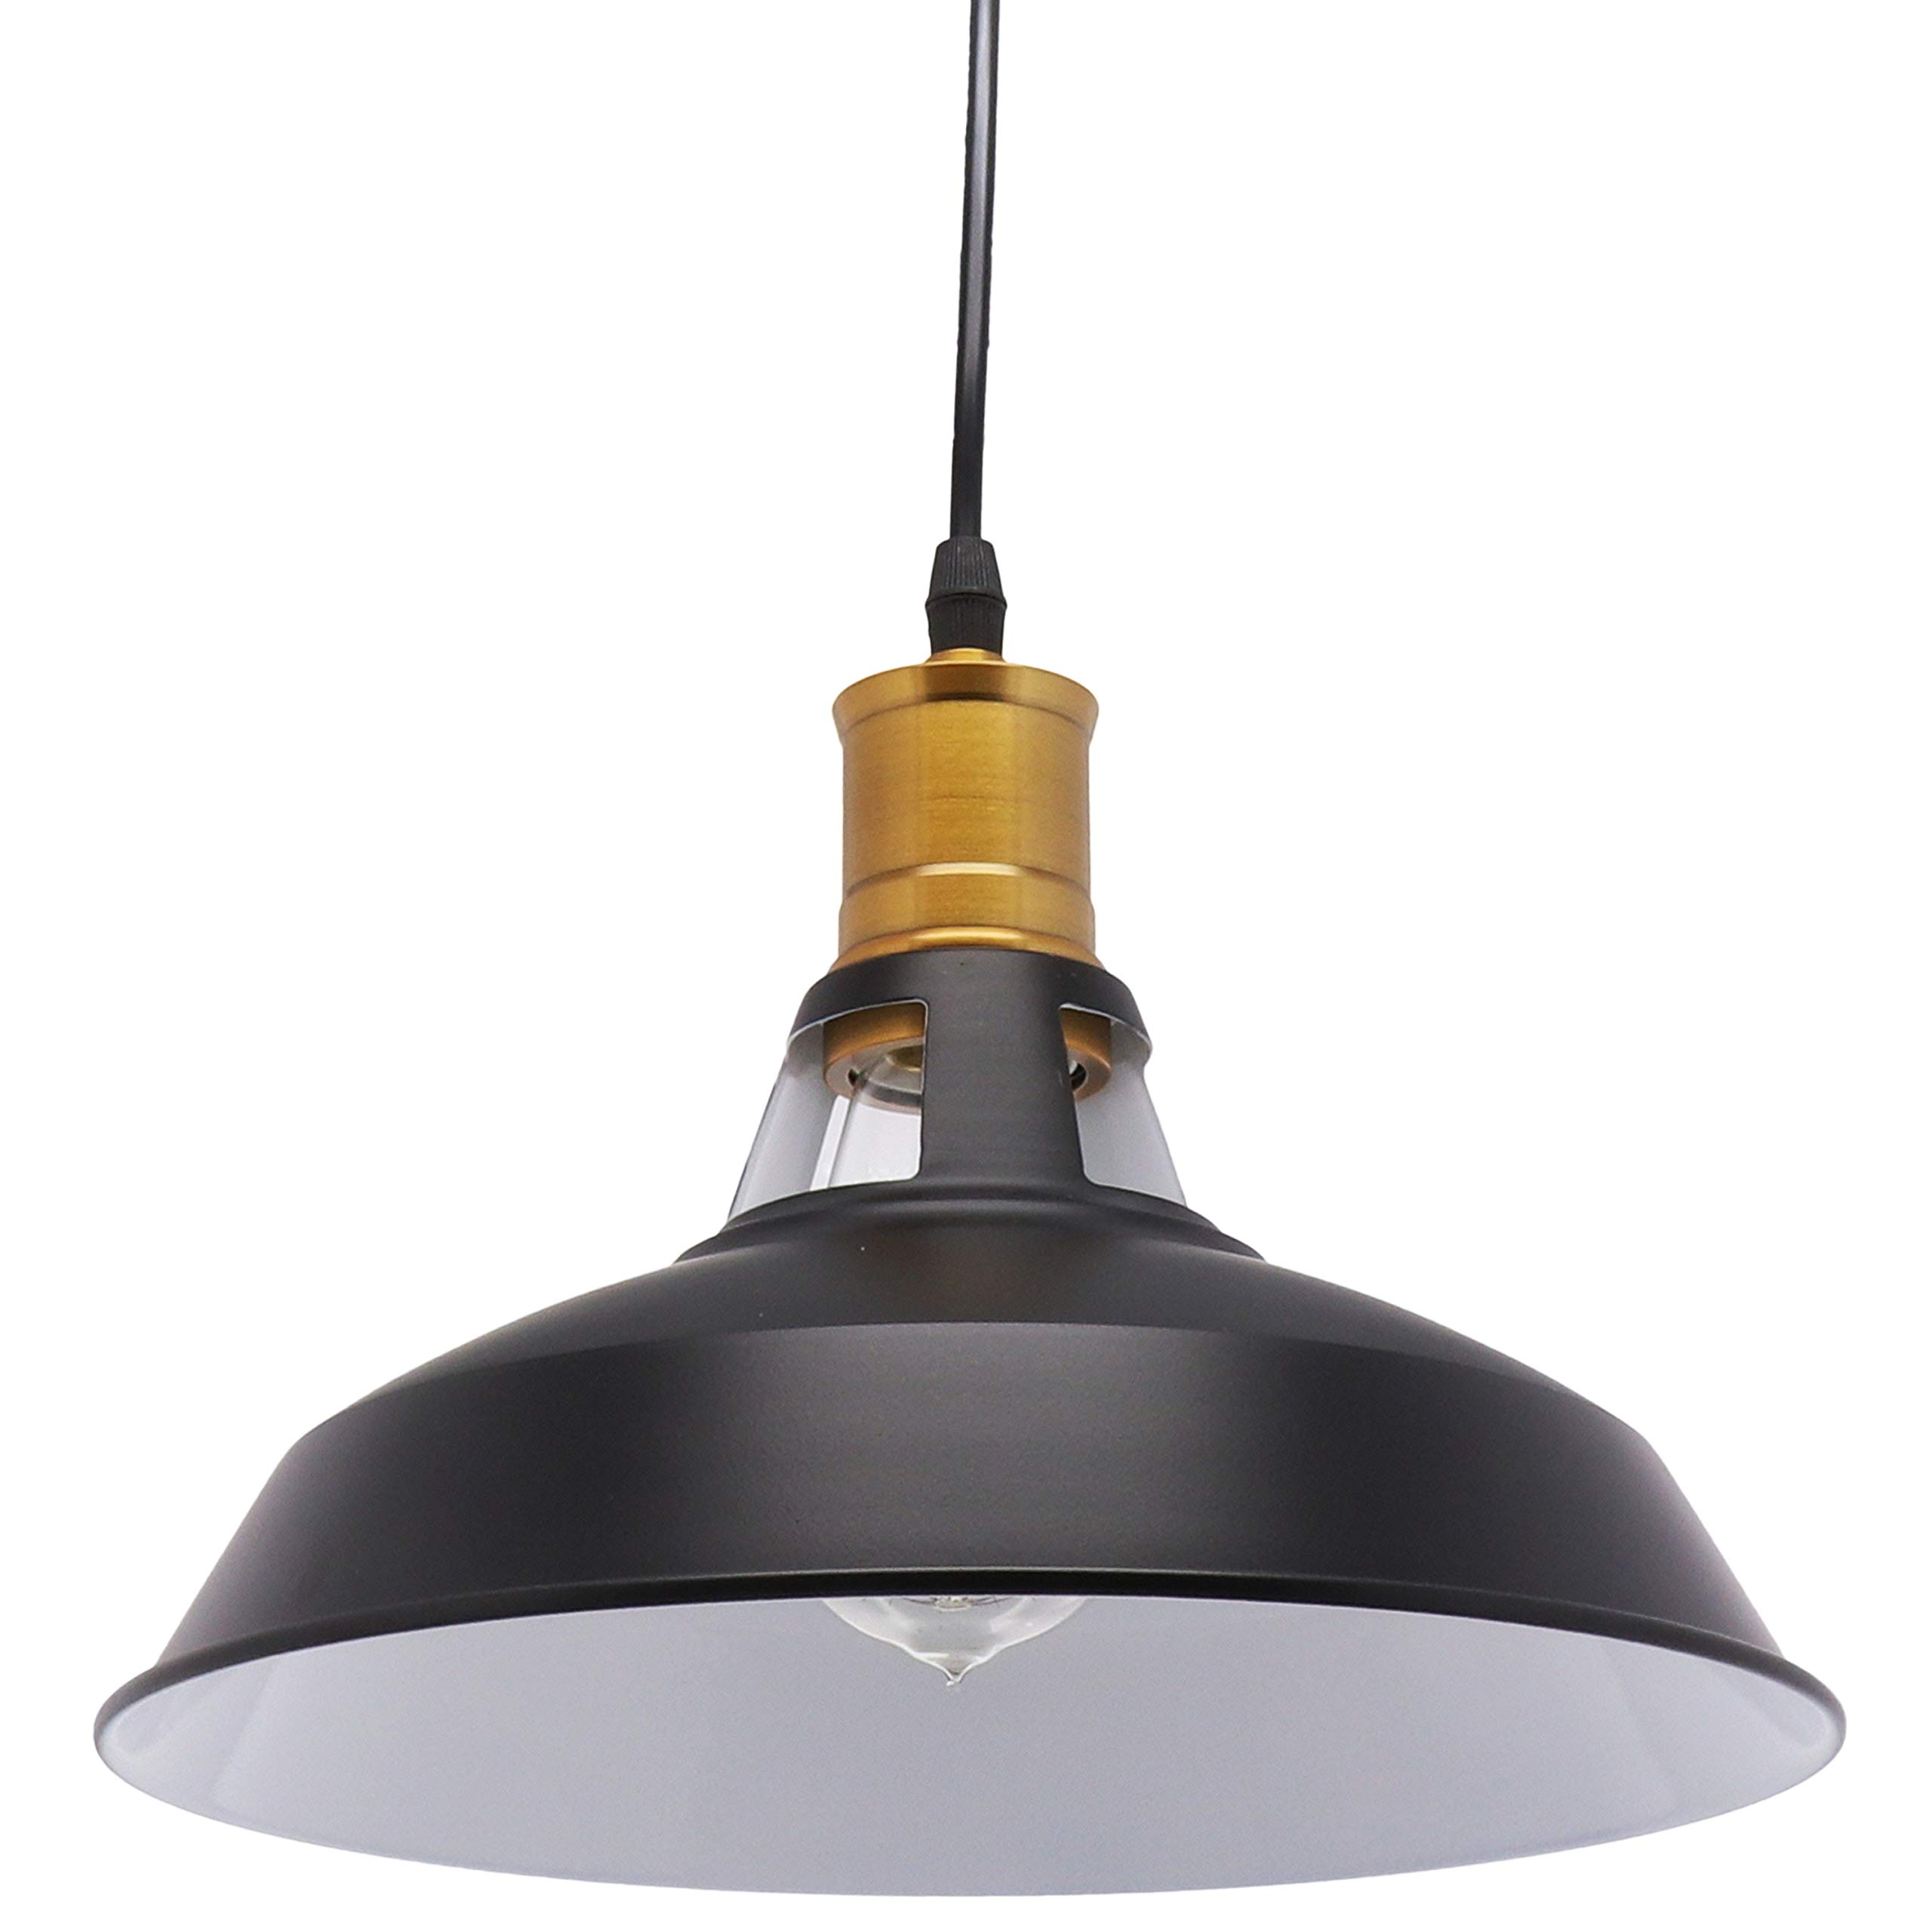 Barnyard Designs 谷仓吊灯现代工业农舍悬挂灯具,黑色 20.32 厘米线哑光面谷仓灯罩,黄铜插座